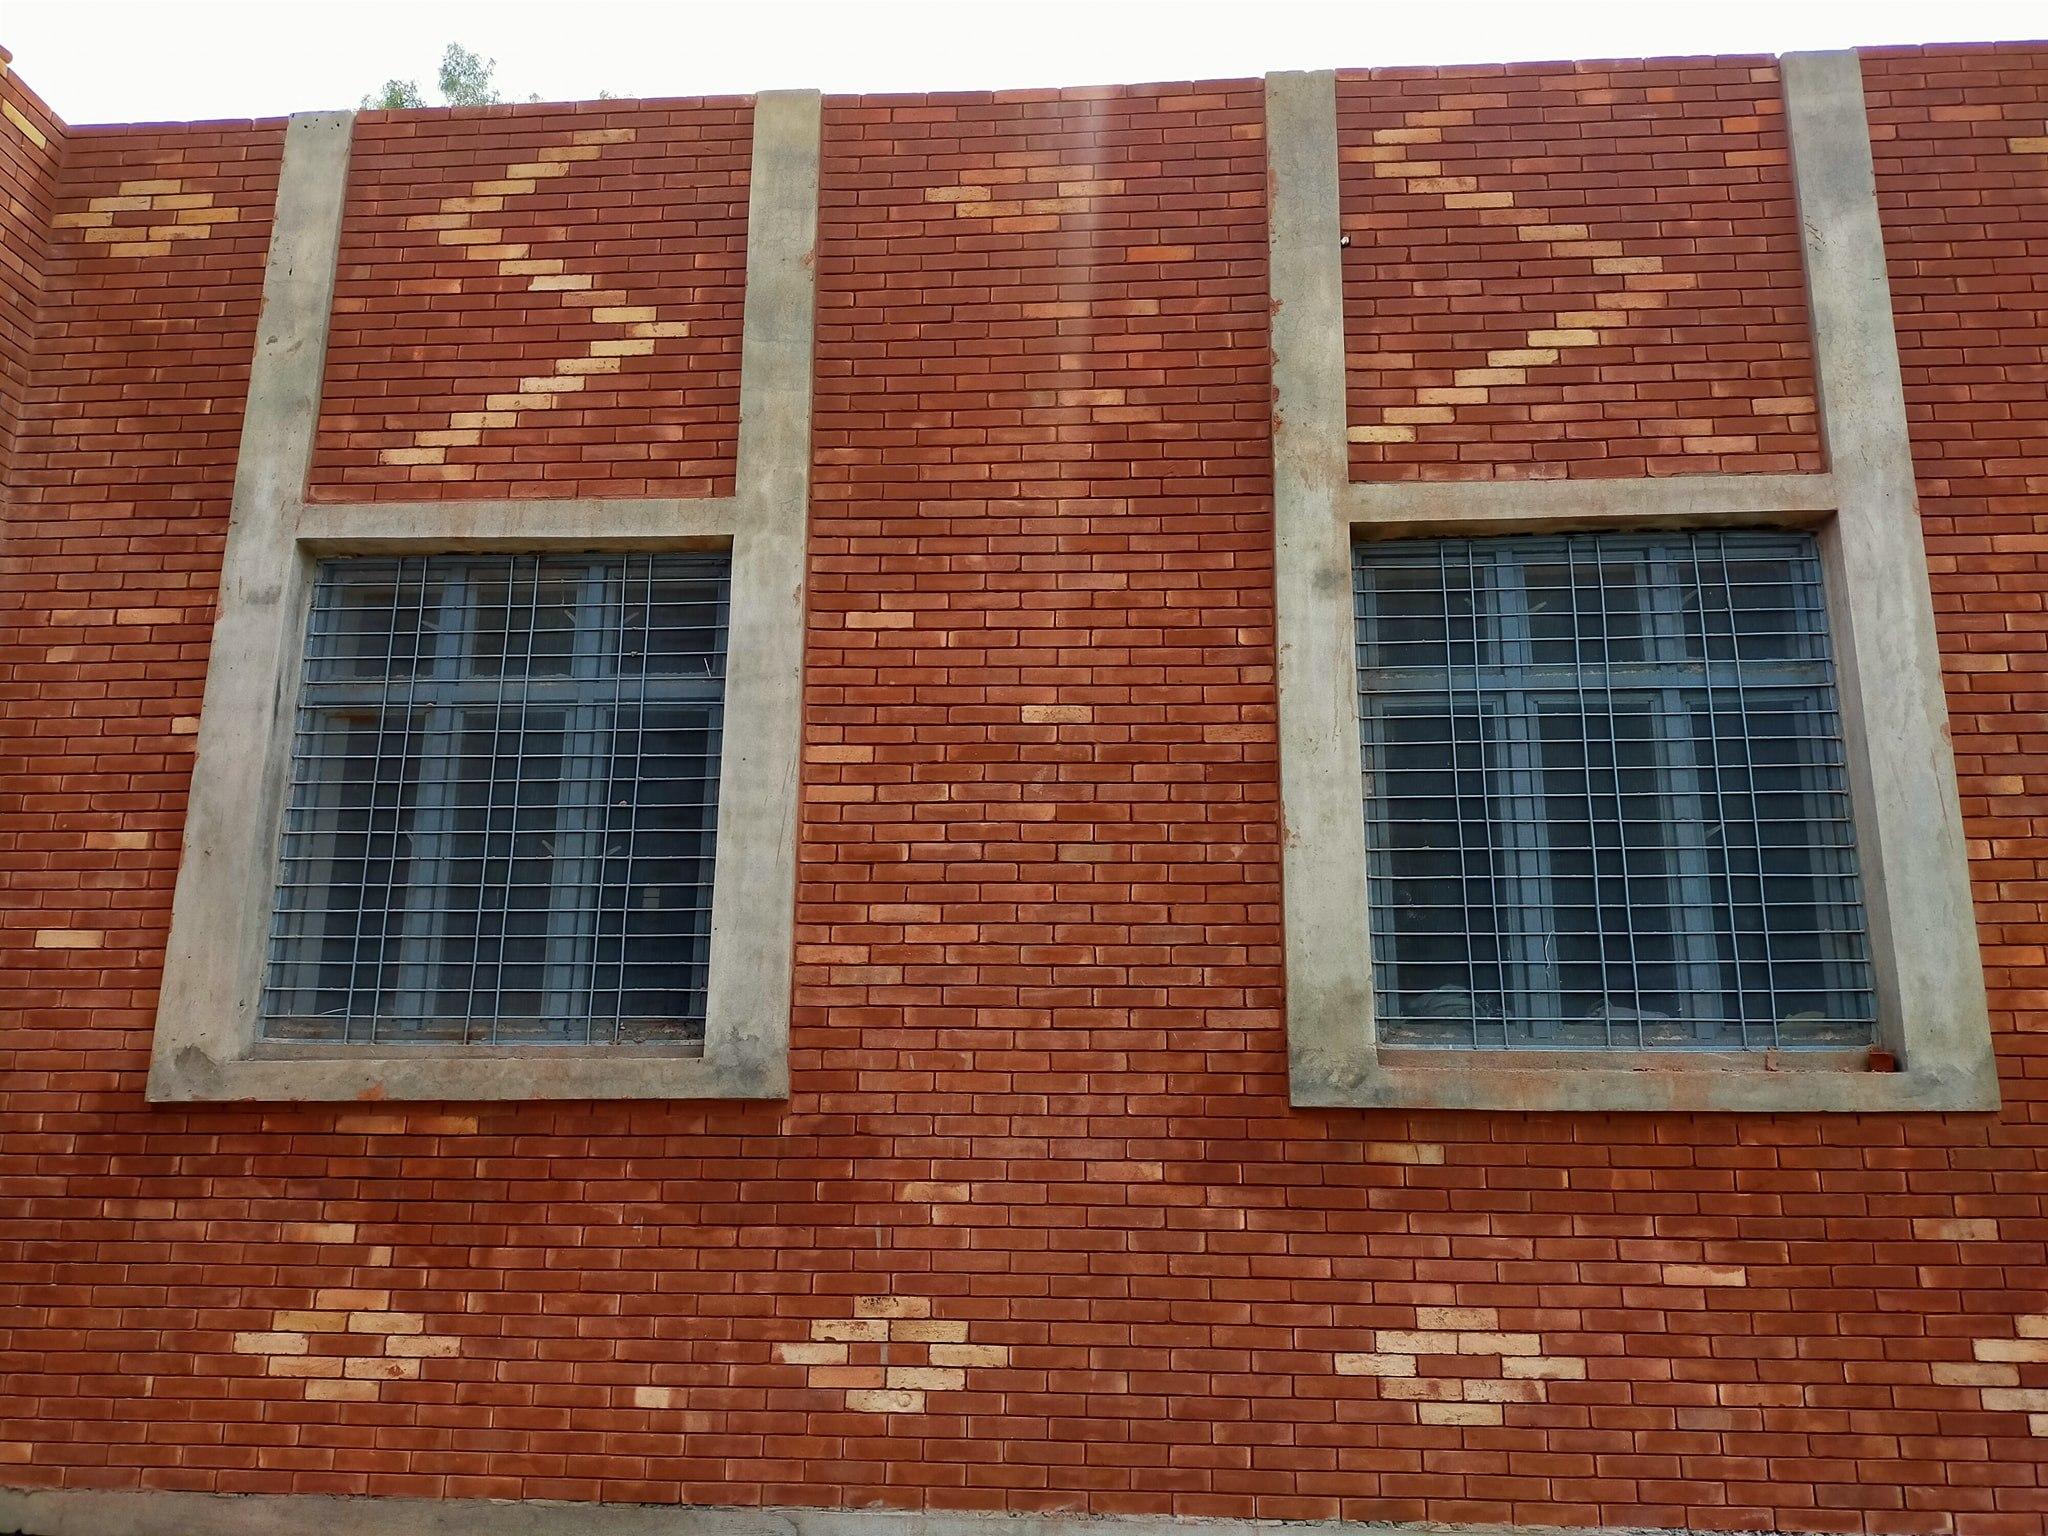 11 Lahori gutka bricks face tiles designs in pakistan